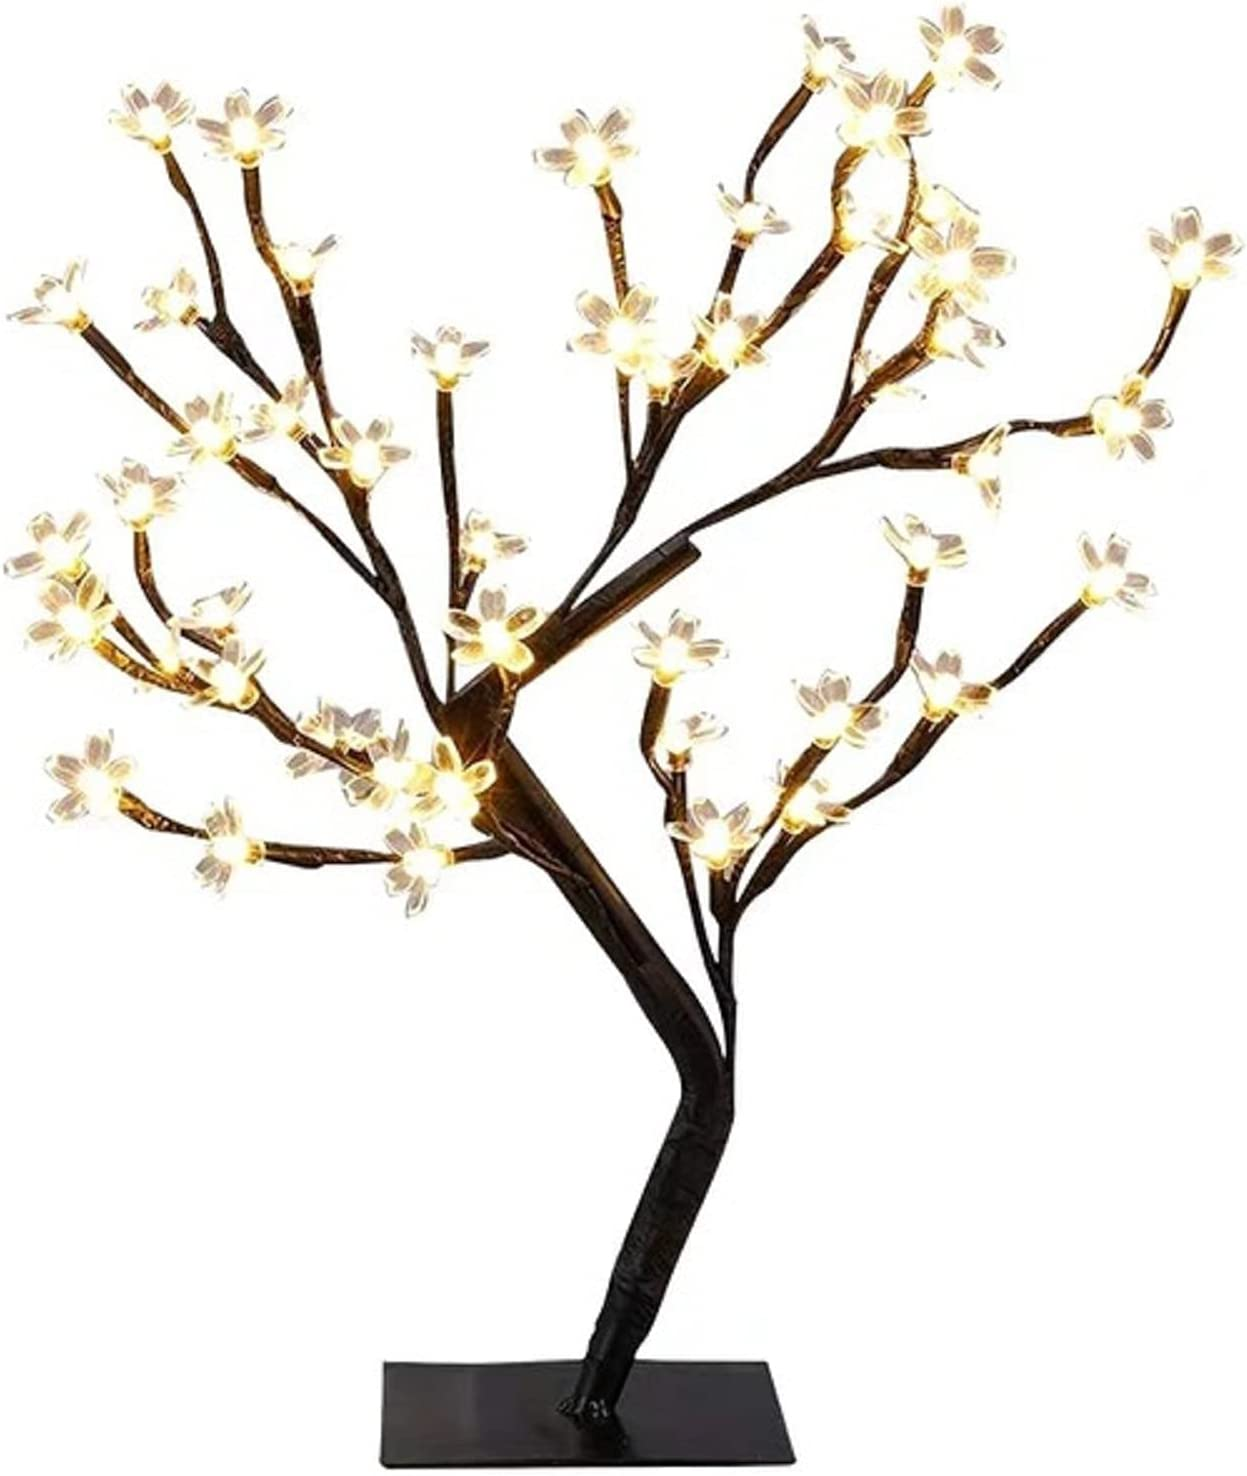 Tramile Iron Frame Christmas led Arlington Mall bauhinia Our shop OFFers the best service Opti Light Tree Fiber